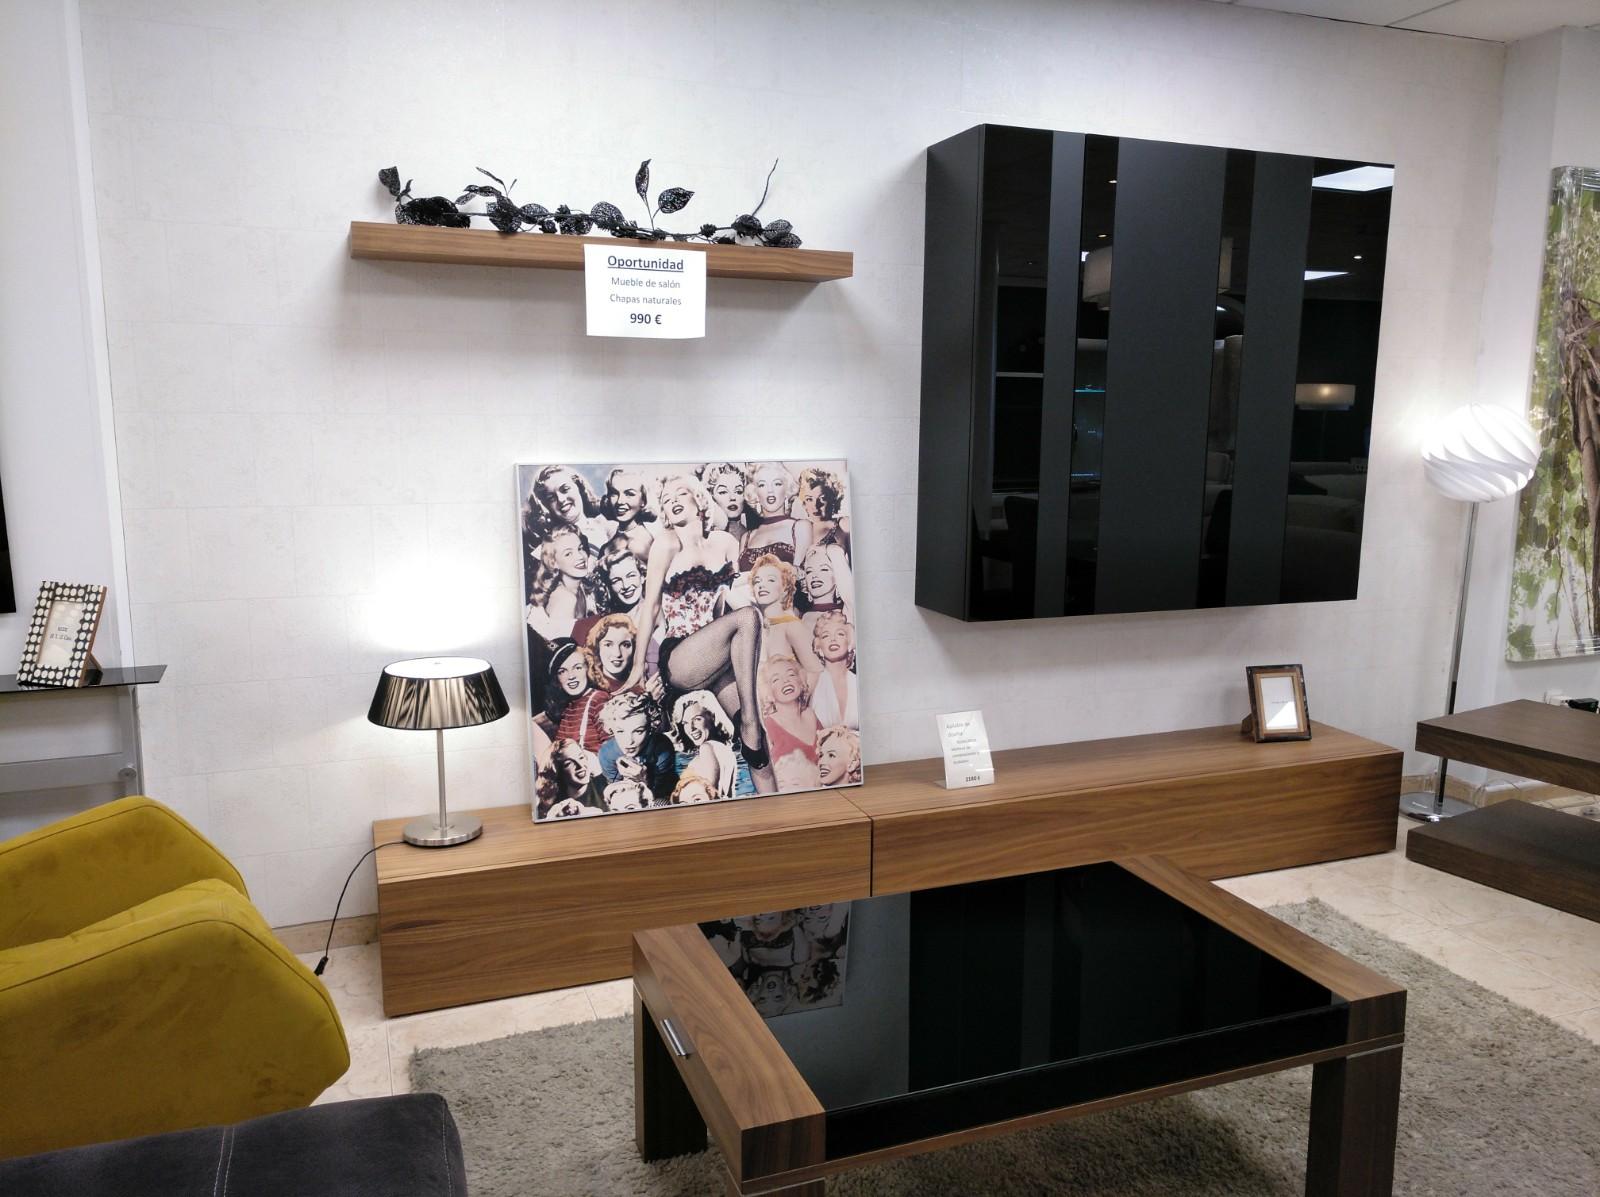 Saldo expo muebles vazquez madrid 1 compramuebles for Muebles vazquez